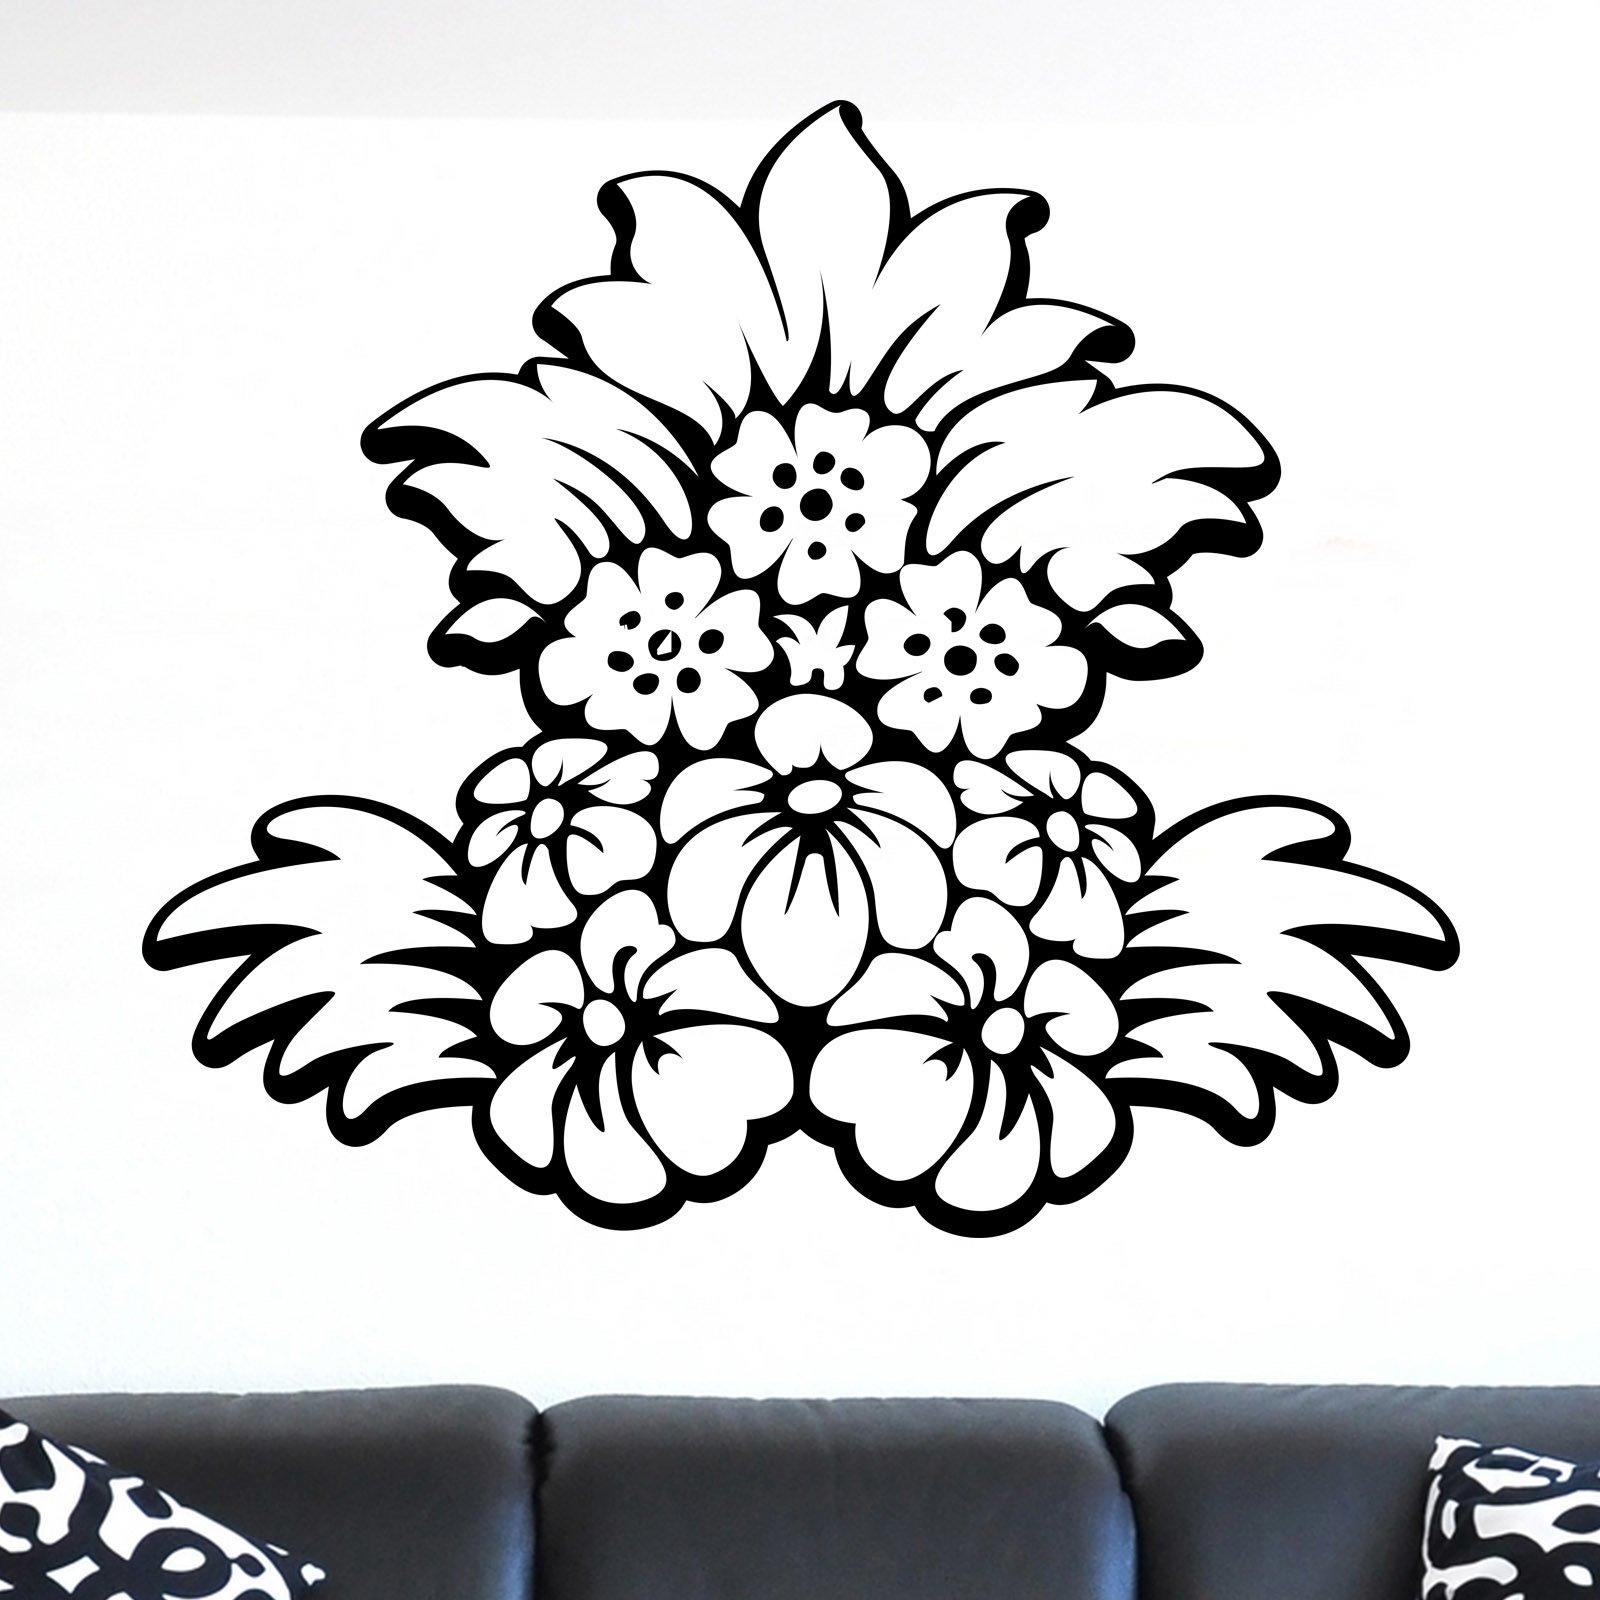 Arranged Flower Design Wall Sticker World of Wall Stickers